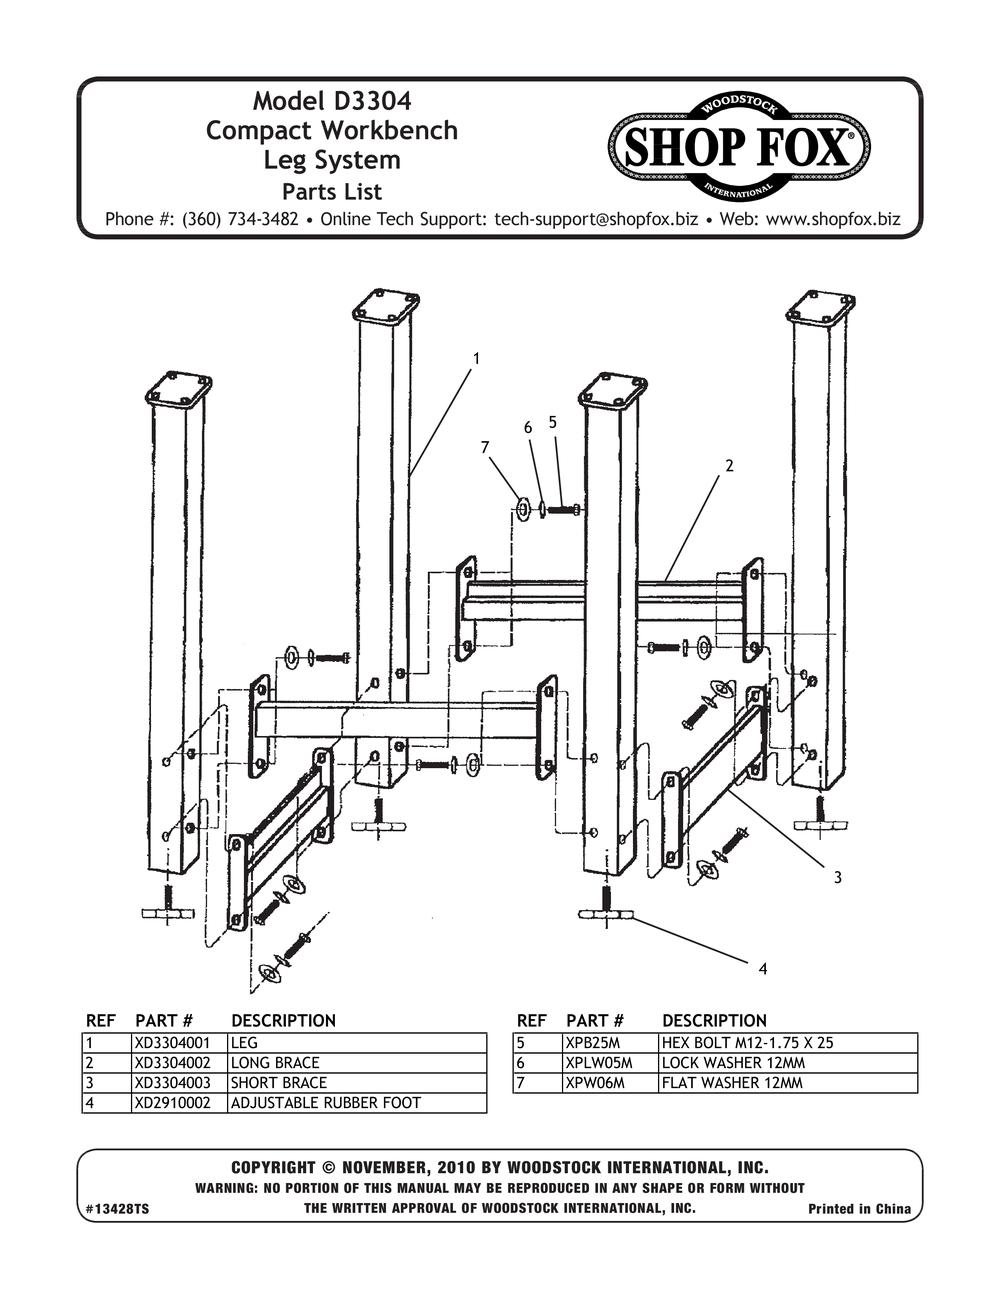 Shop Fox D3304 Workbench Leg System Small